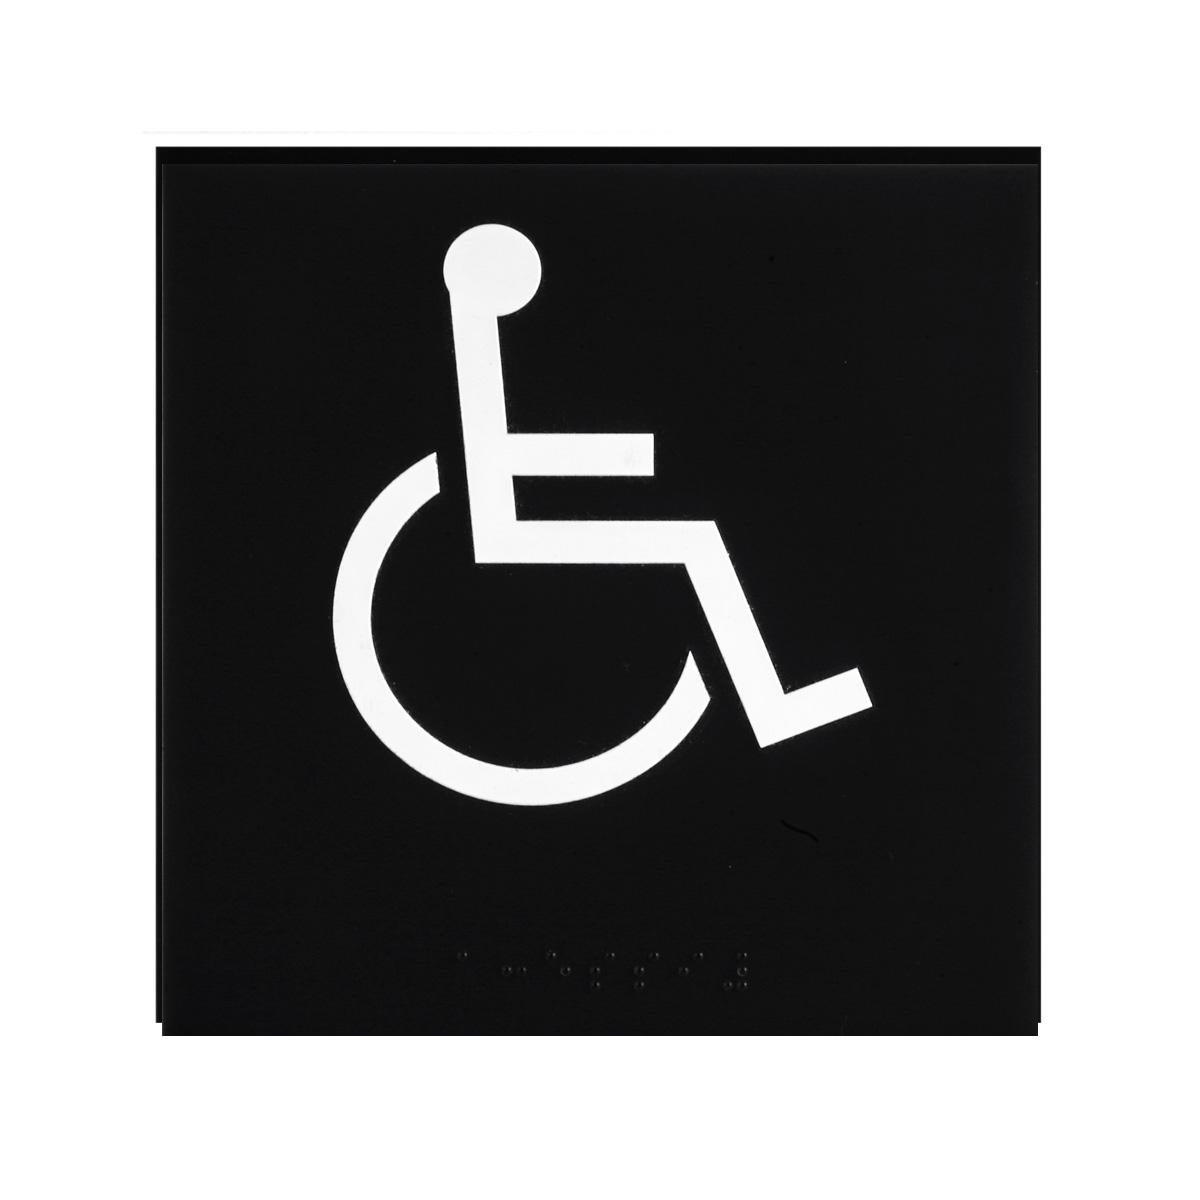 ADA Braille Accessible Exit Sign Engraved Applique Grade 2